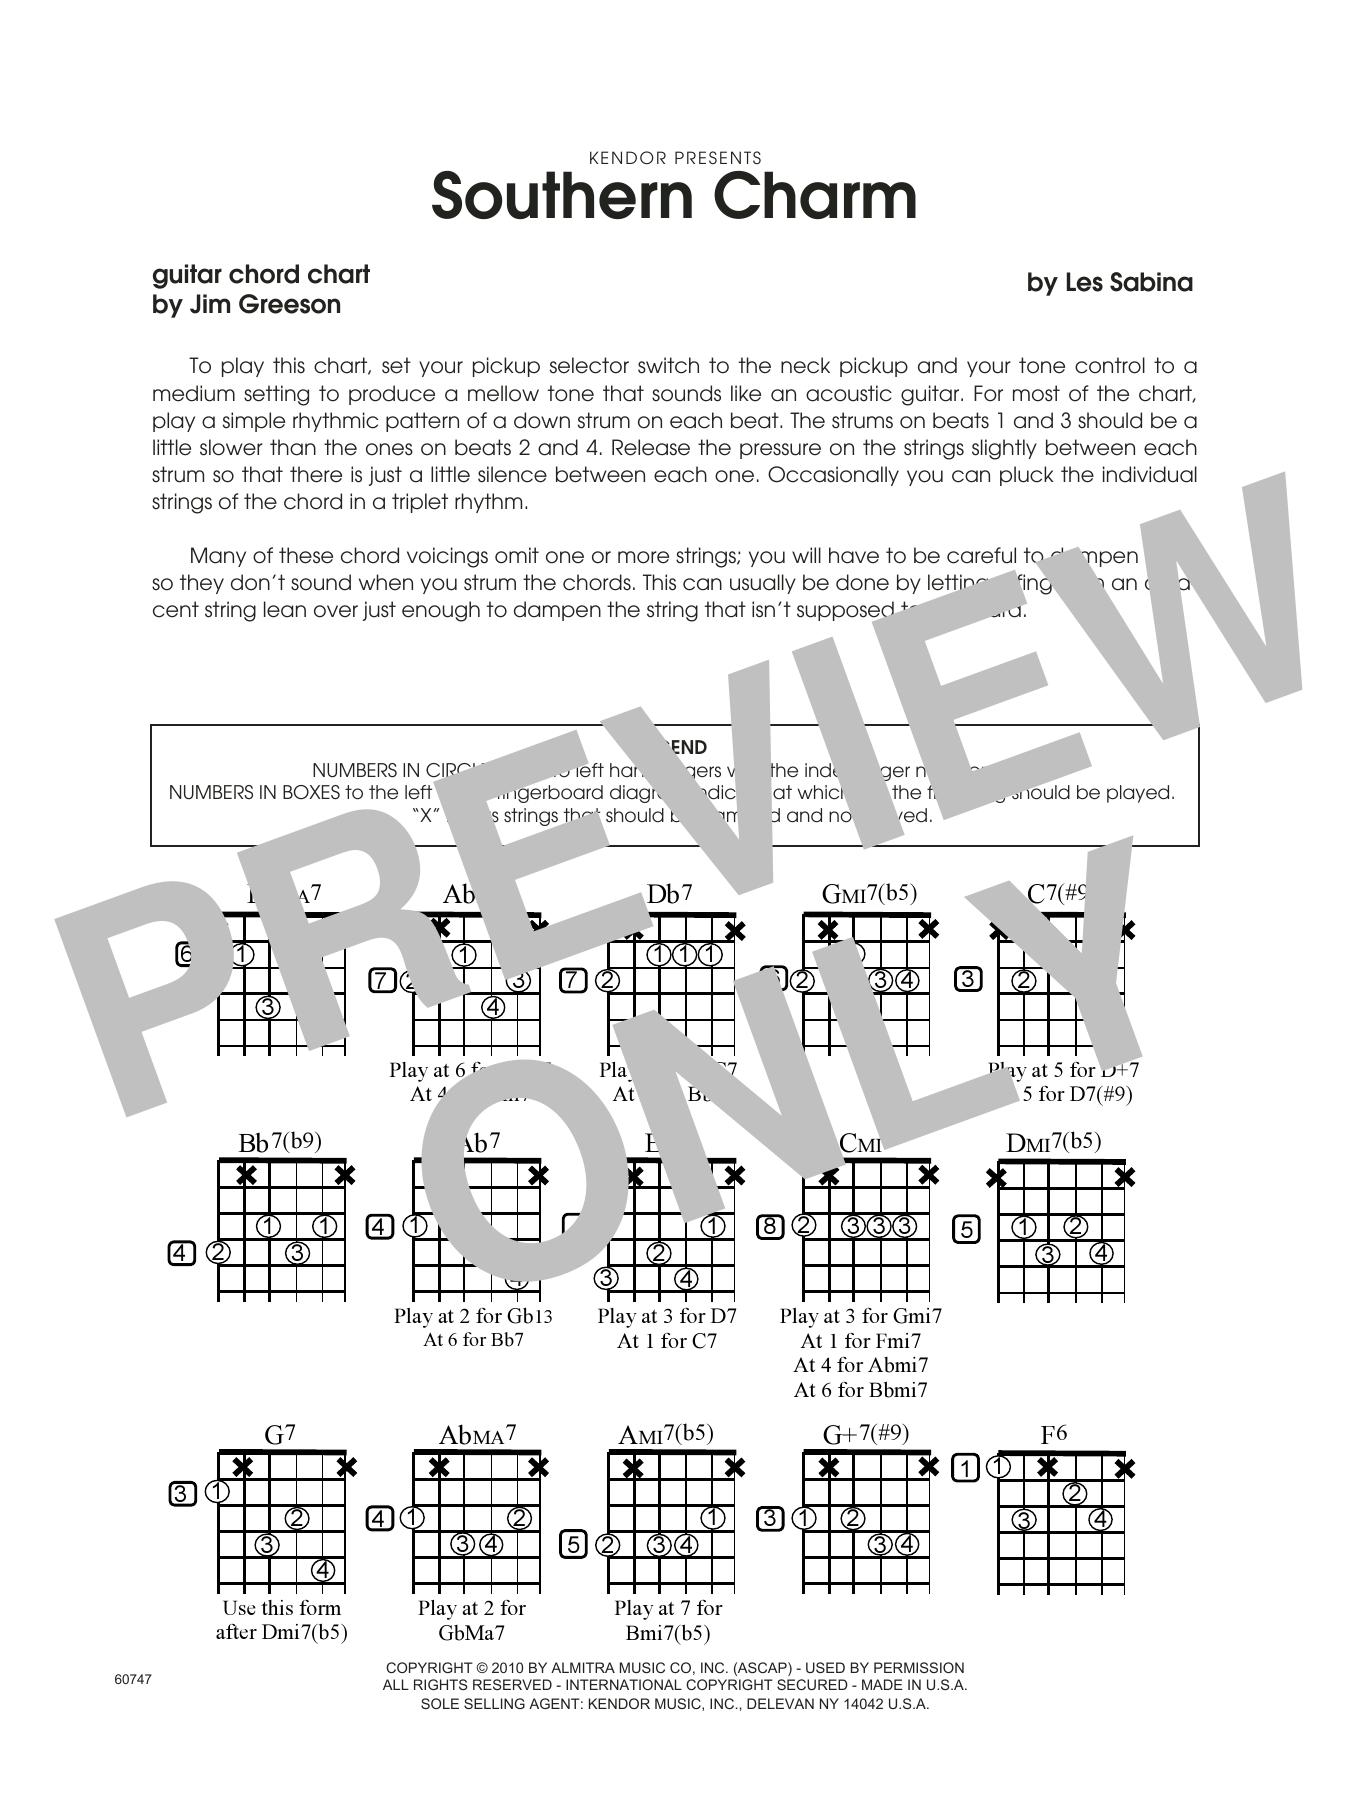 Southern Charm - Guitar Chord Chart Sheet Music